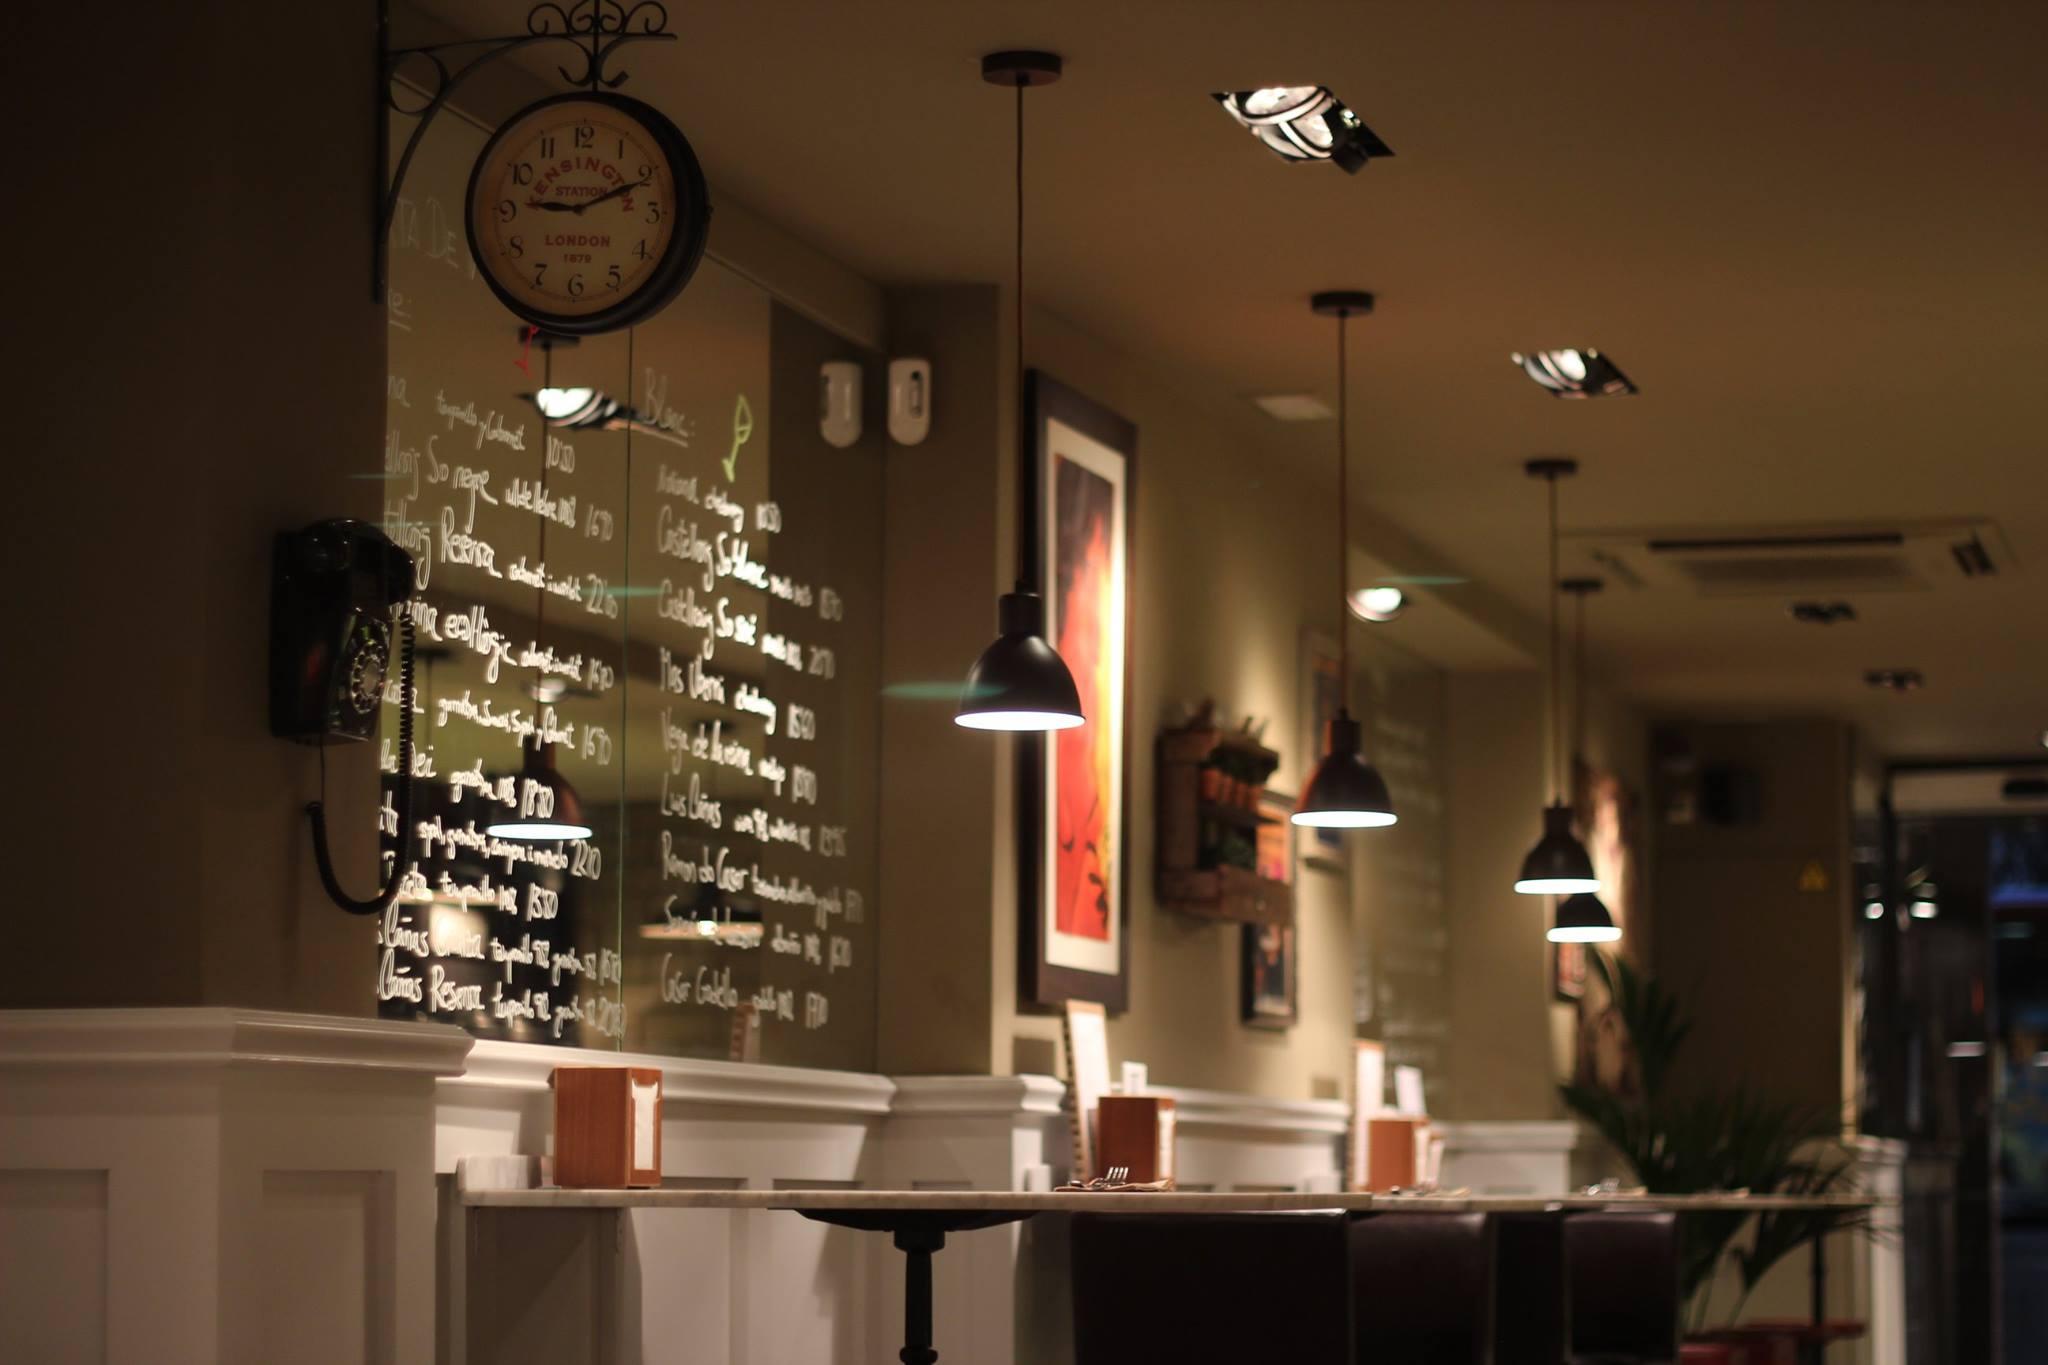 estel de sant pau restaurante